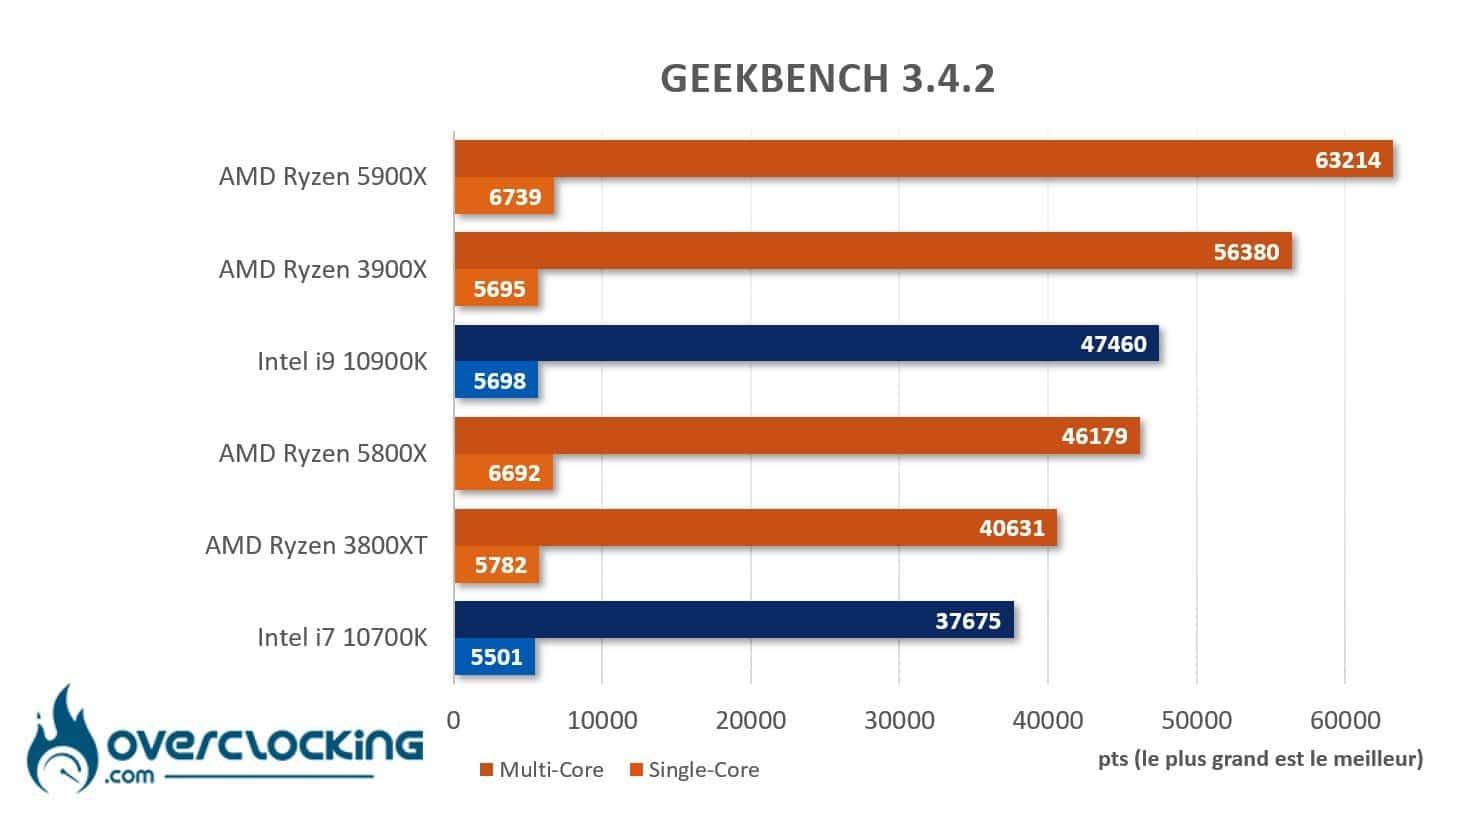 AMD Ryzen 5800X et 5900X sous Geekbench 3